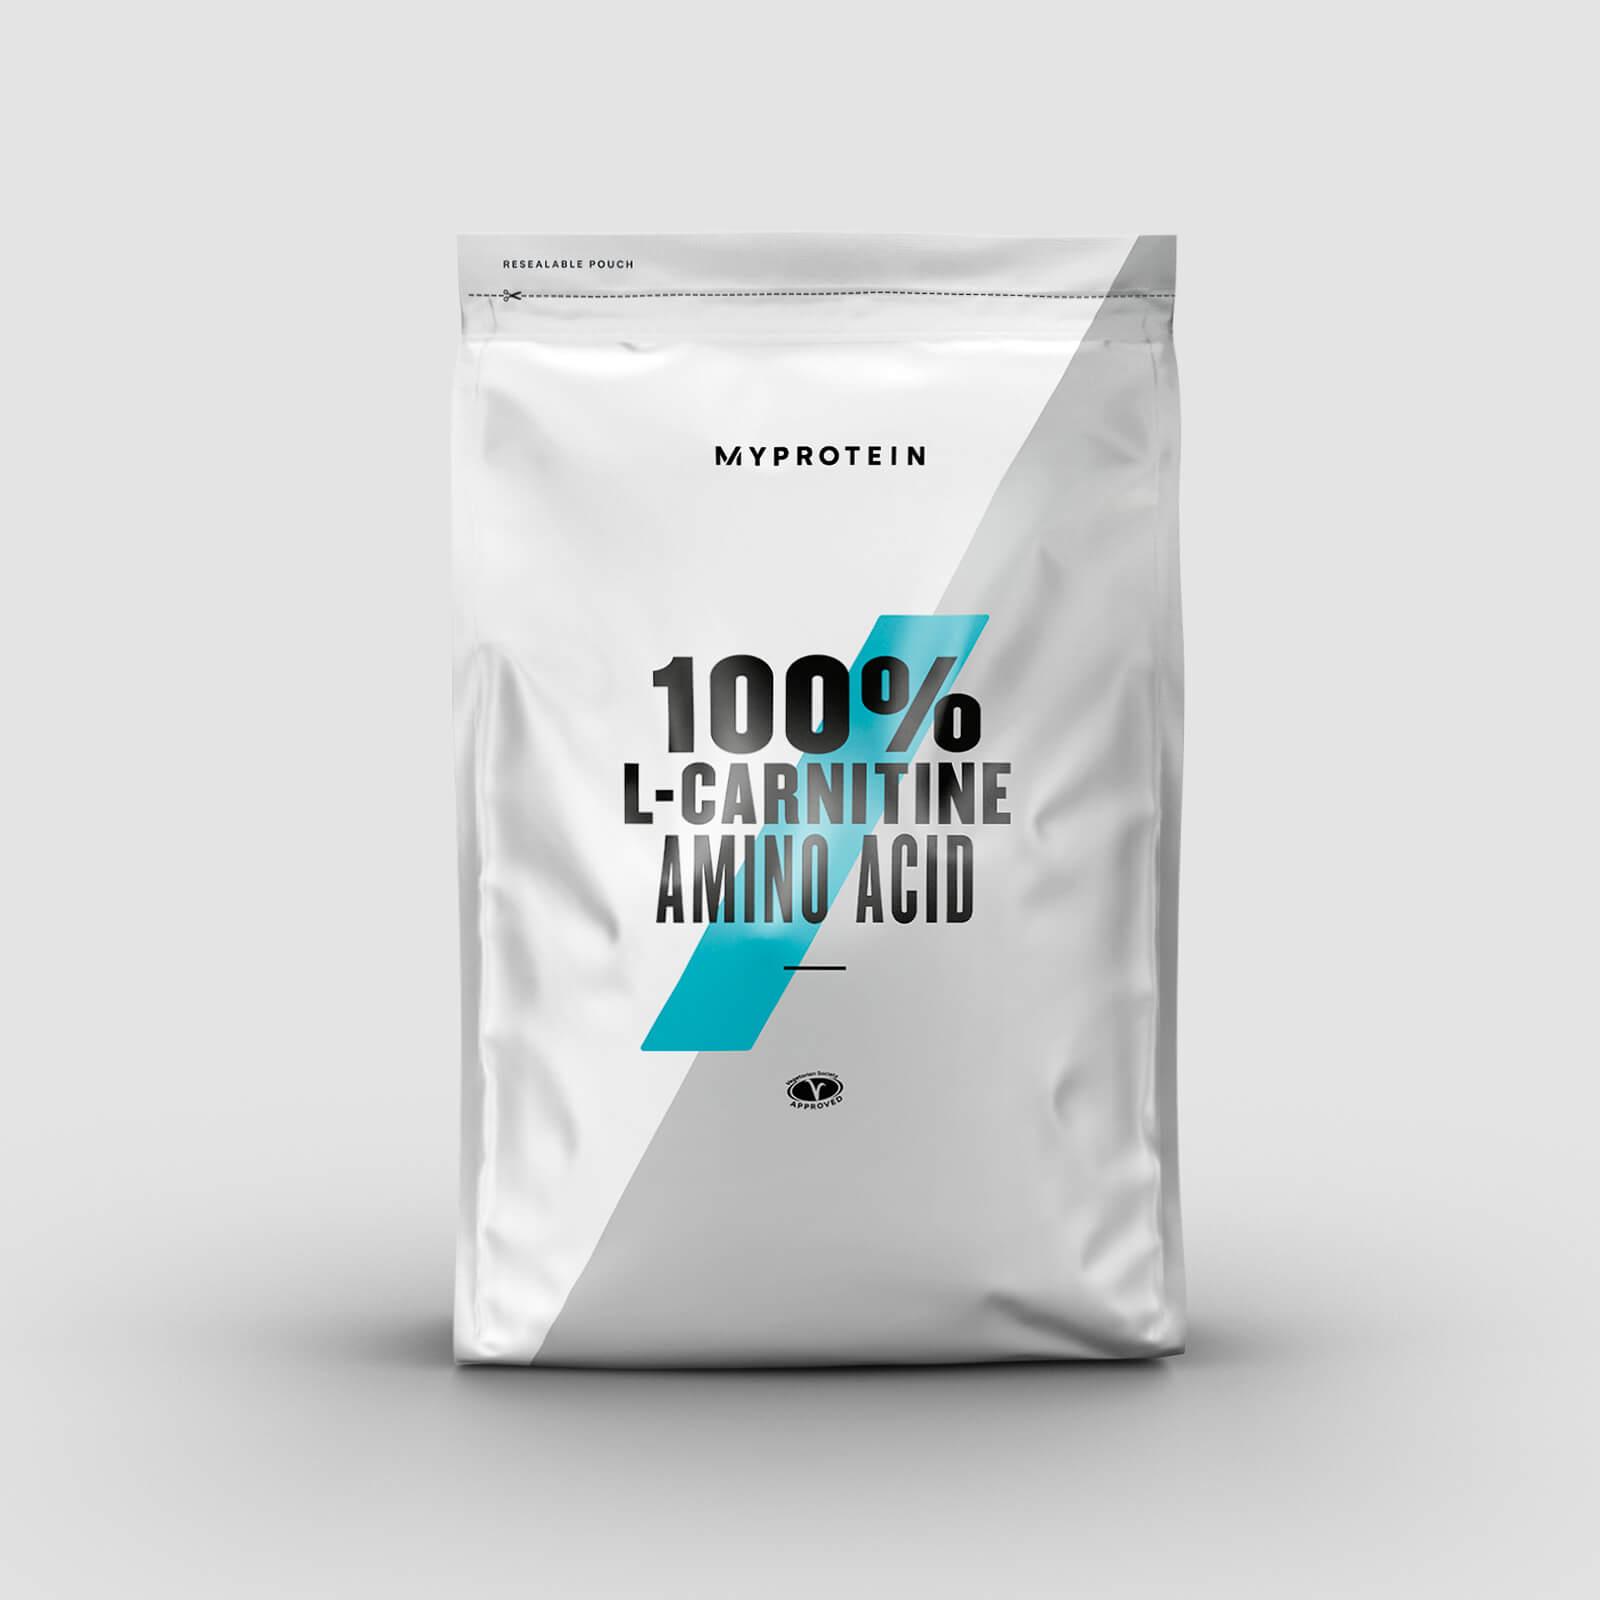 Myprotein 100% L Carnitine - 1kg - Sans arôme ajouté